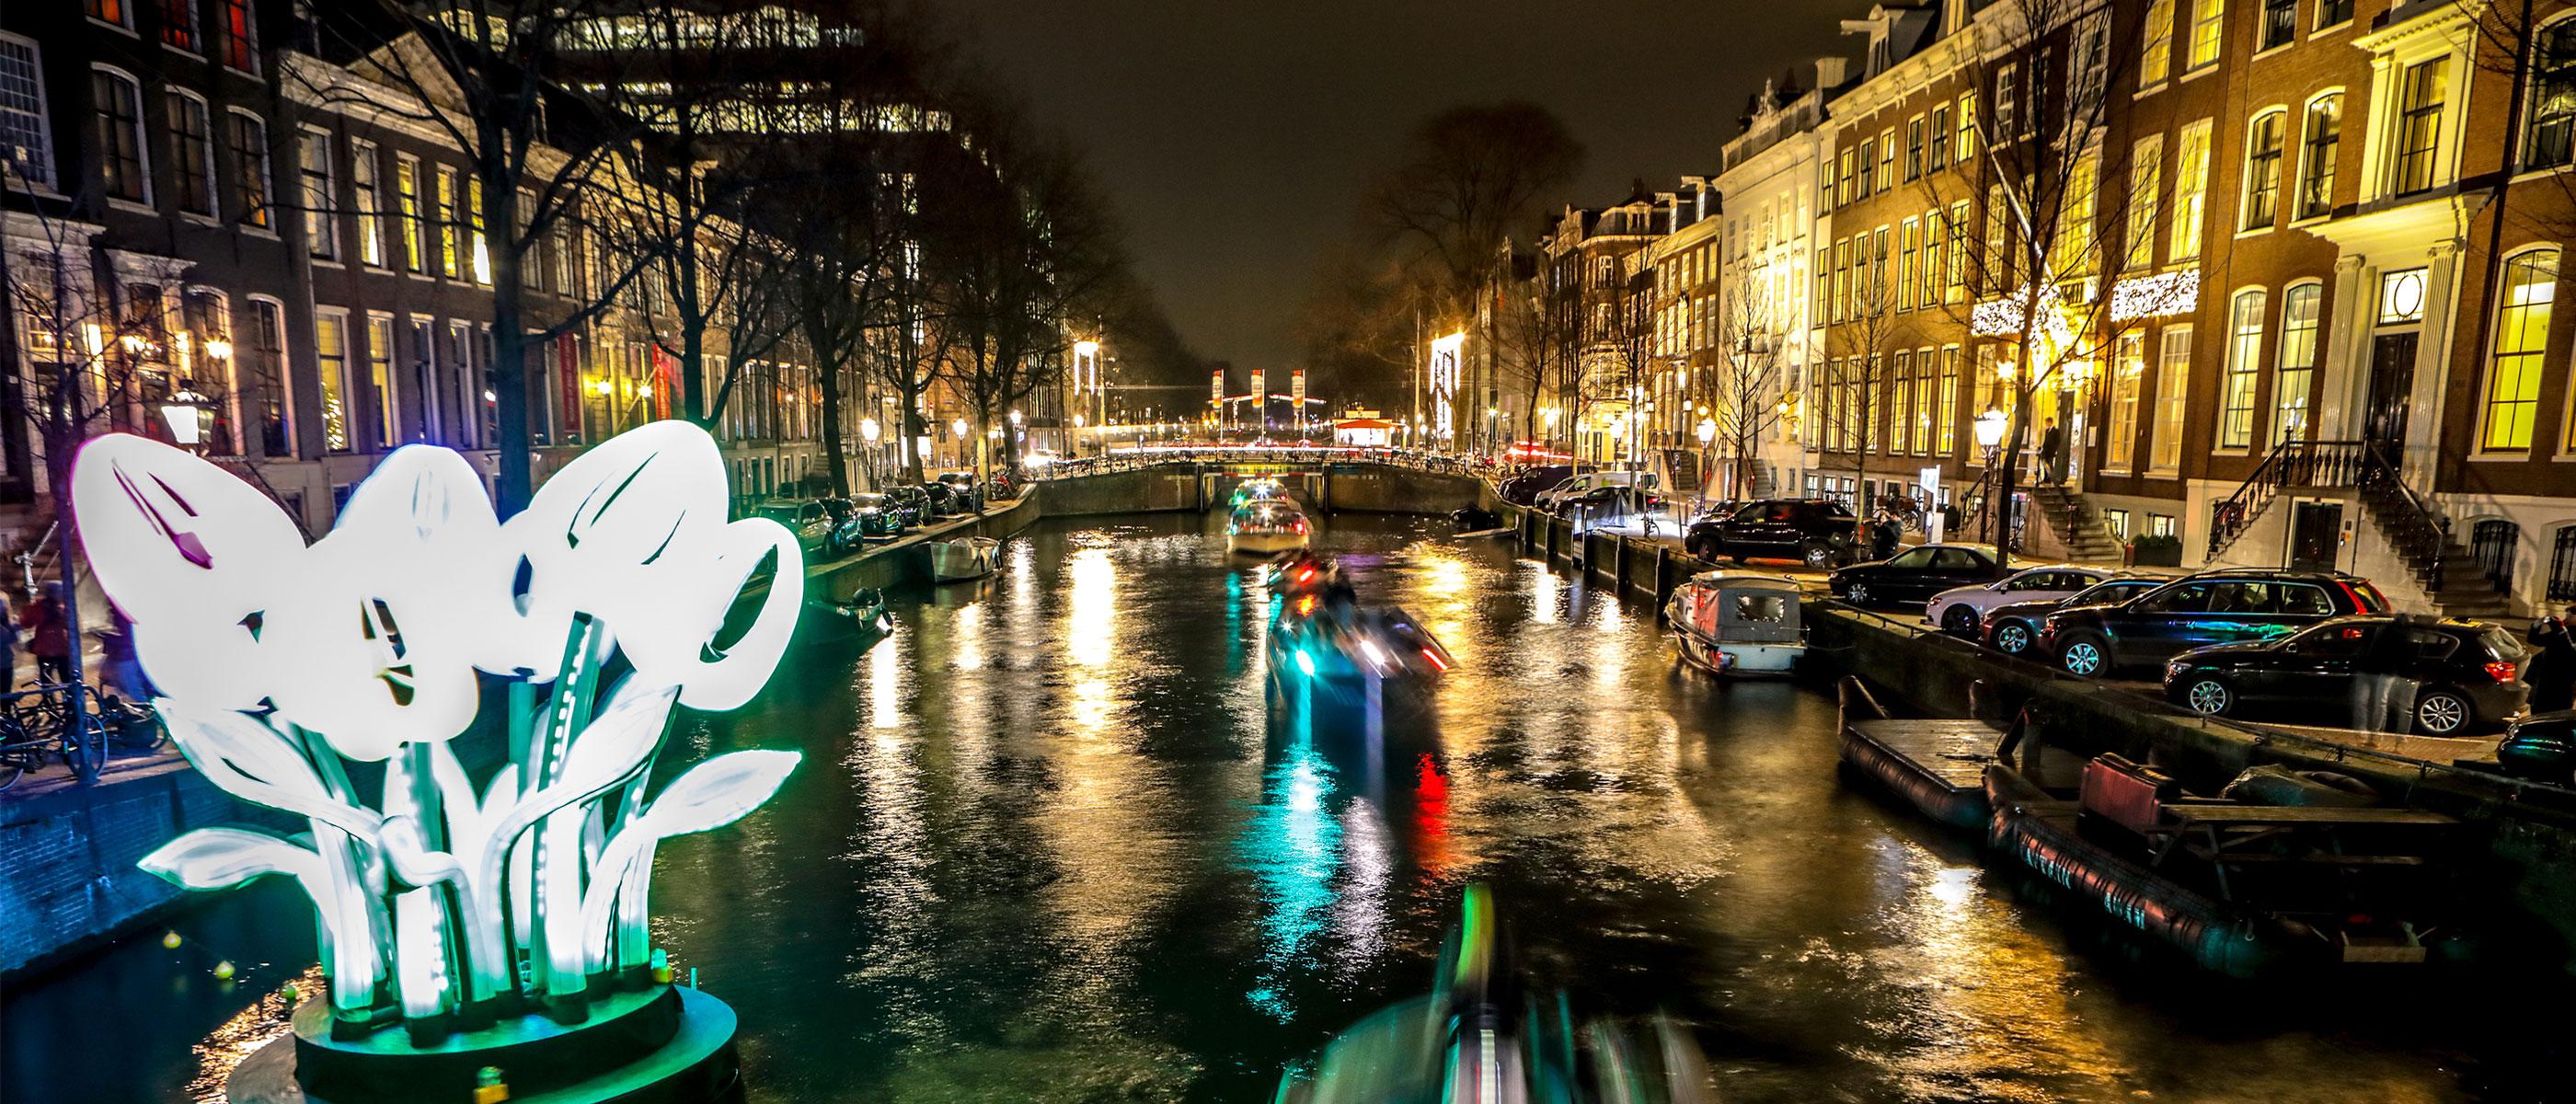 lysfestivalen-amsterdam-julemarked-januar